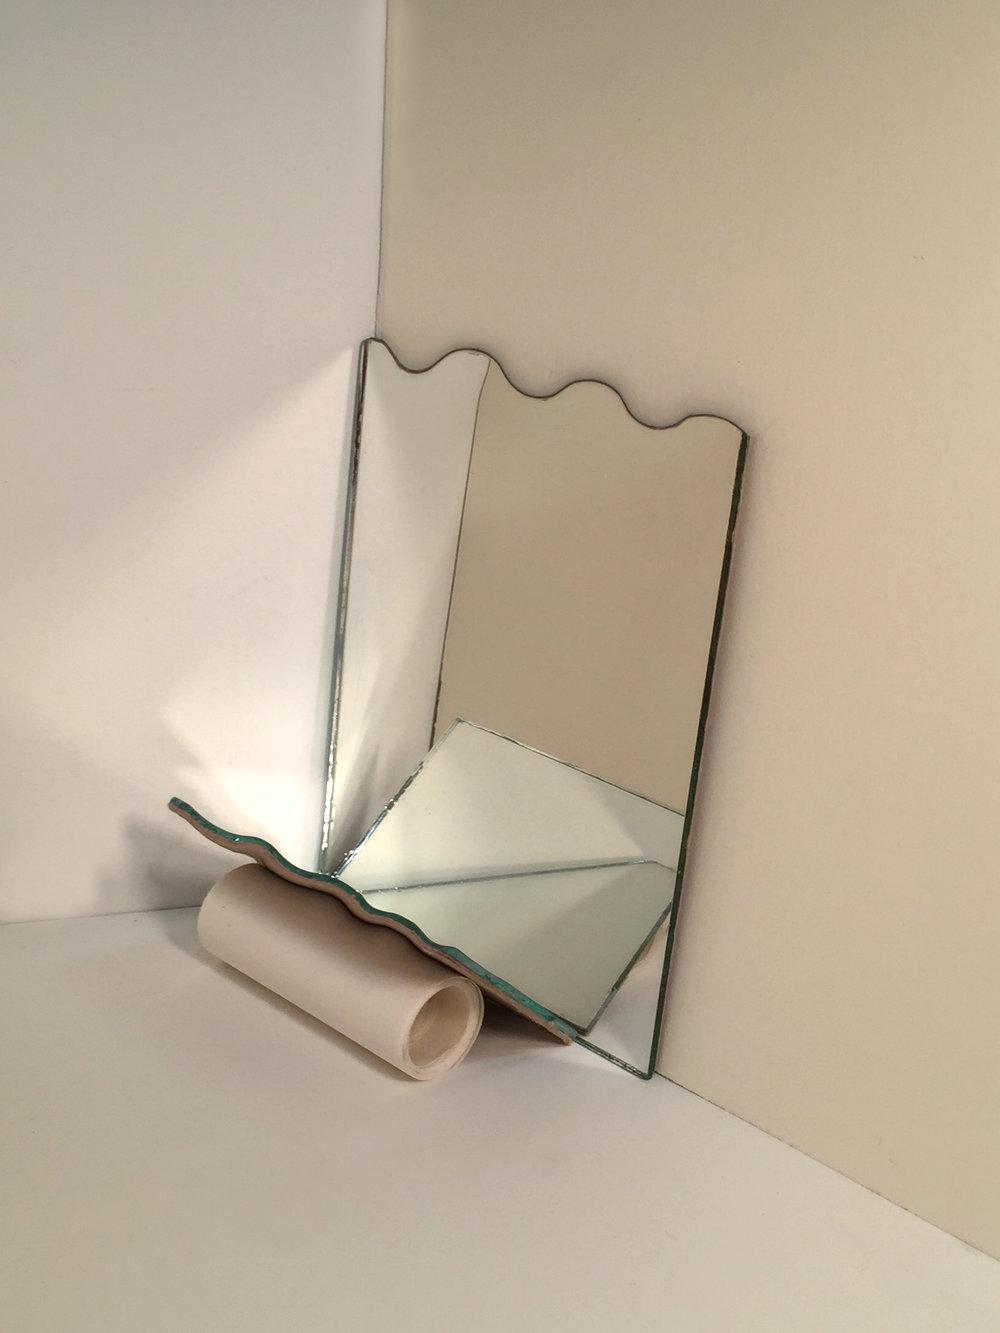 MirrorStudy22.2.jpg